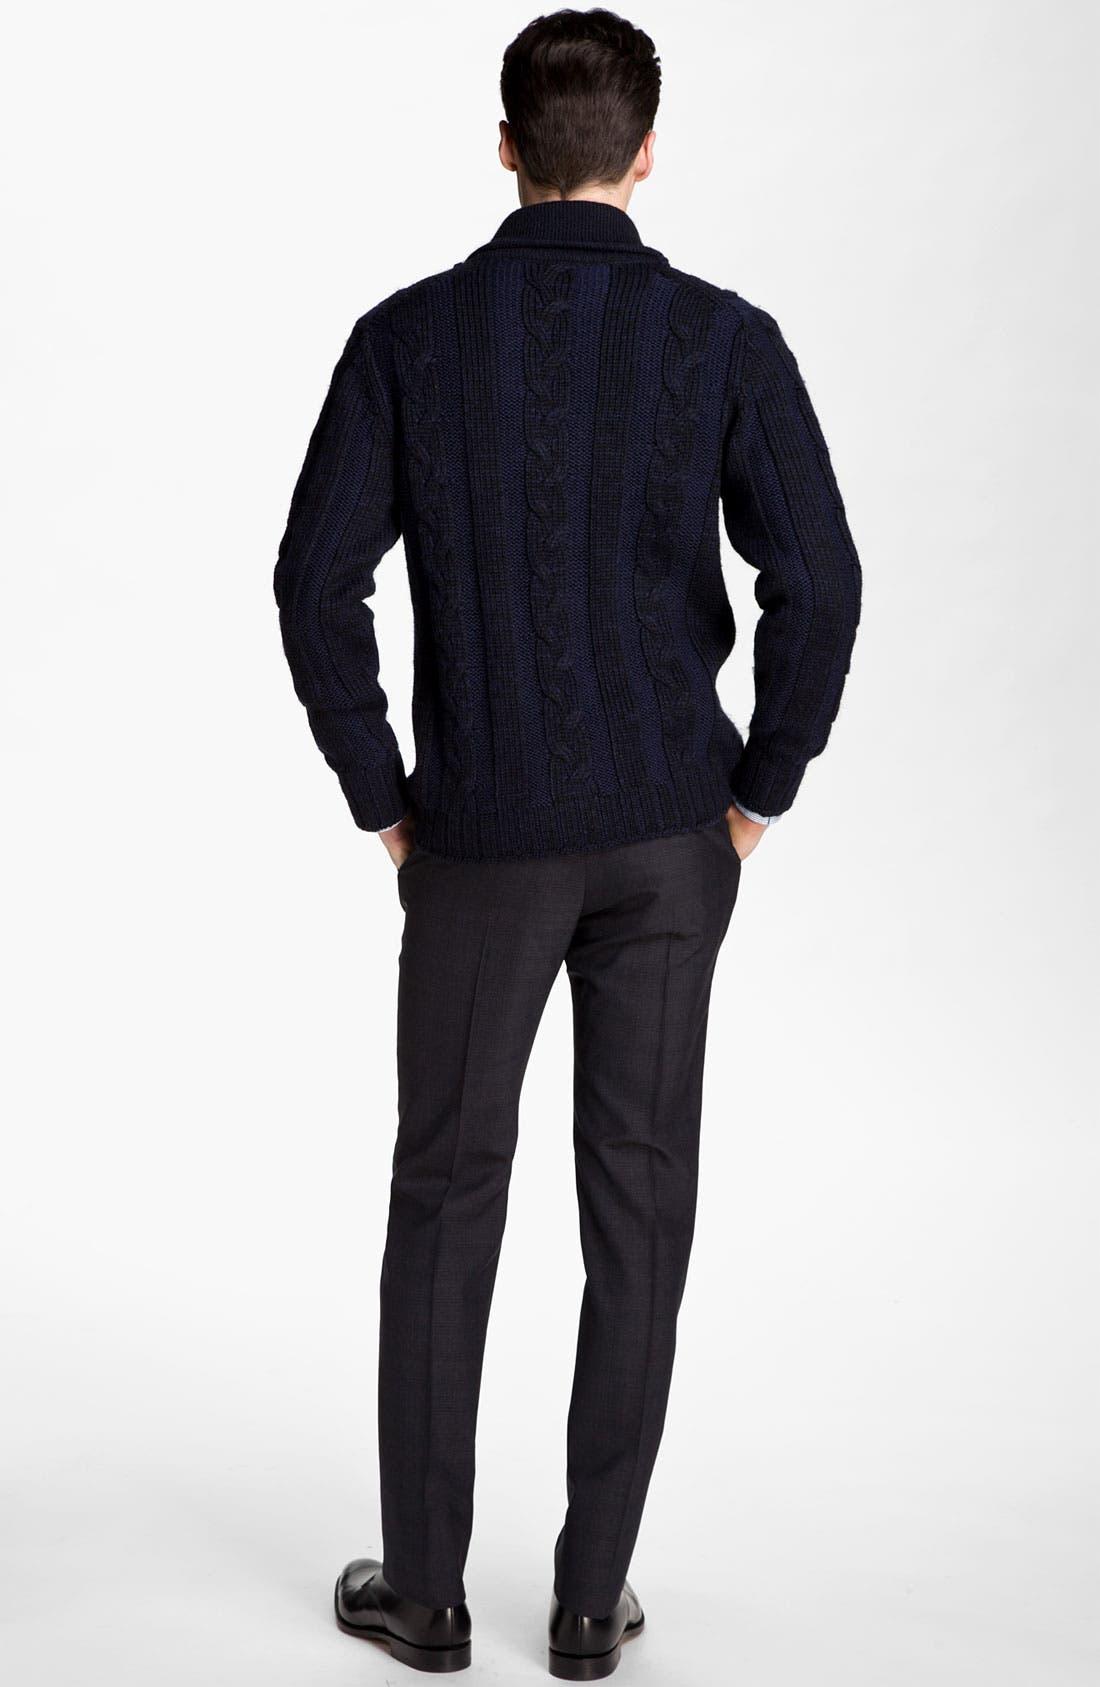 Alternate Image 1 Selected - Paul Smith London Sweater, Dress Shirt & Trousers